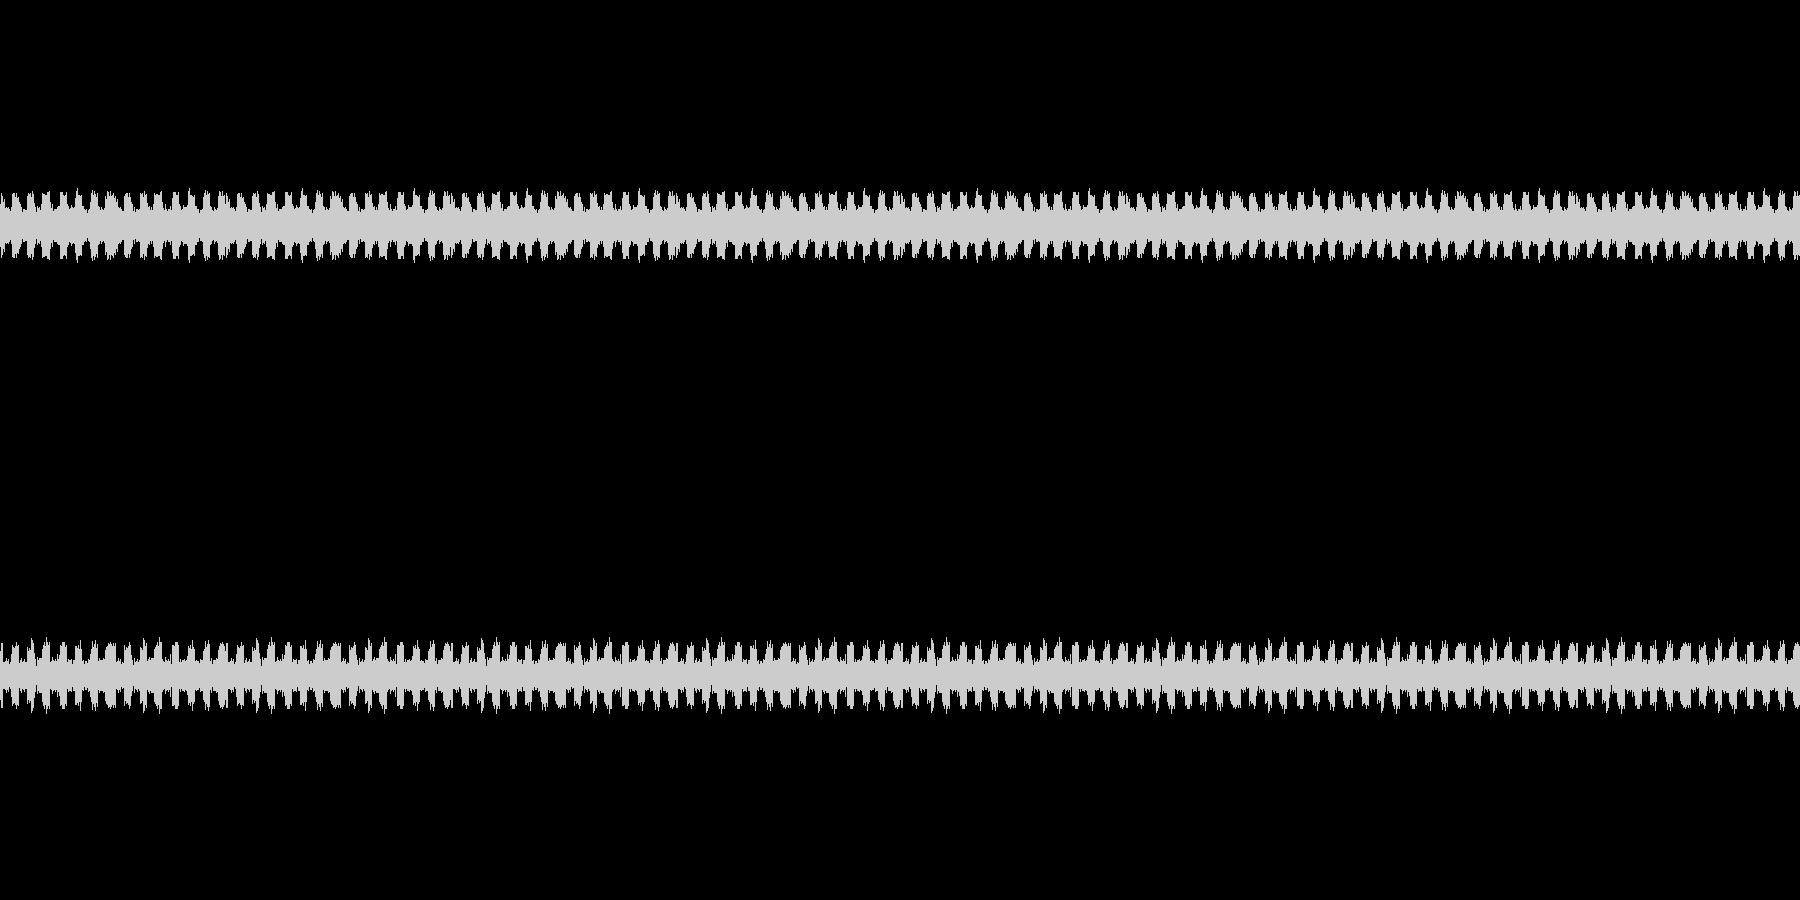 ASMR 音フェチApp用 ノイズ 4の未再生の波形